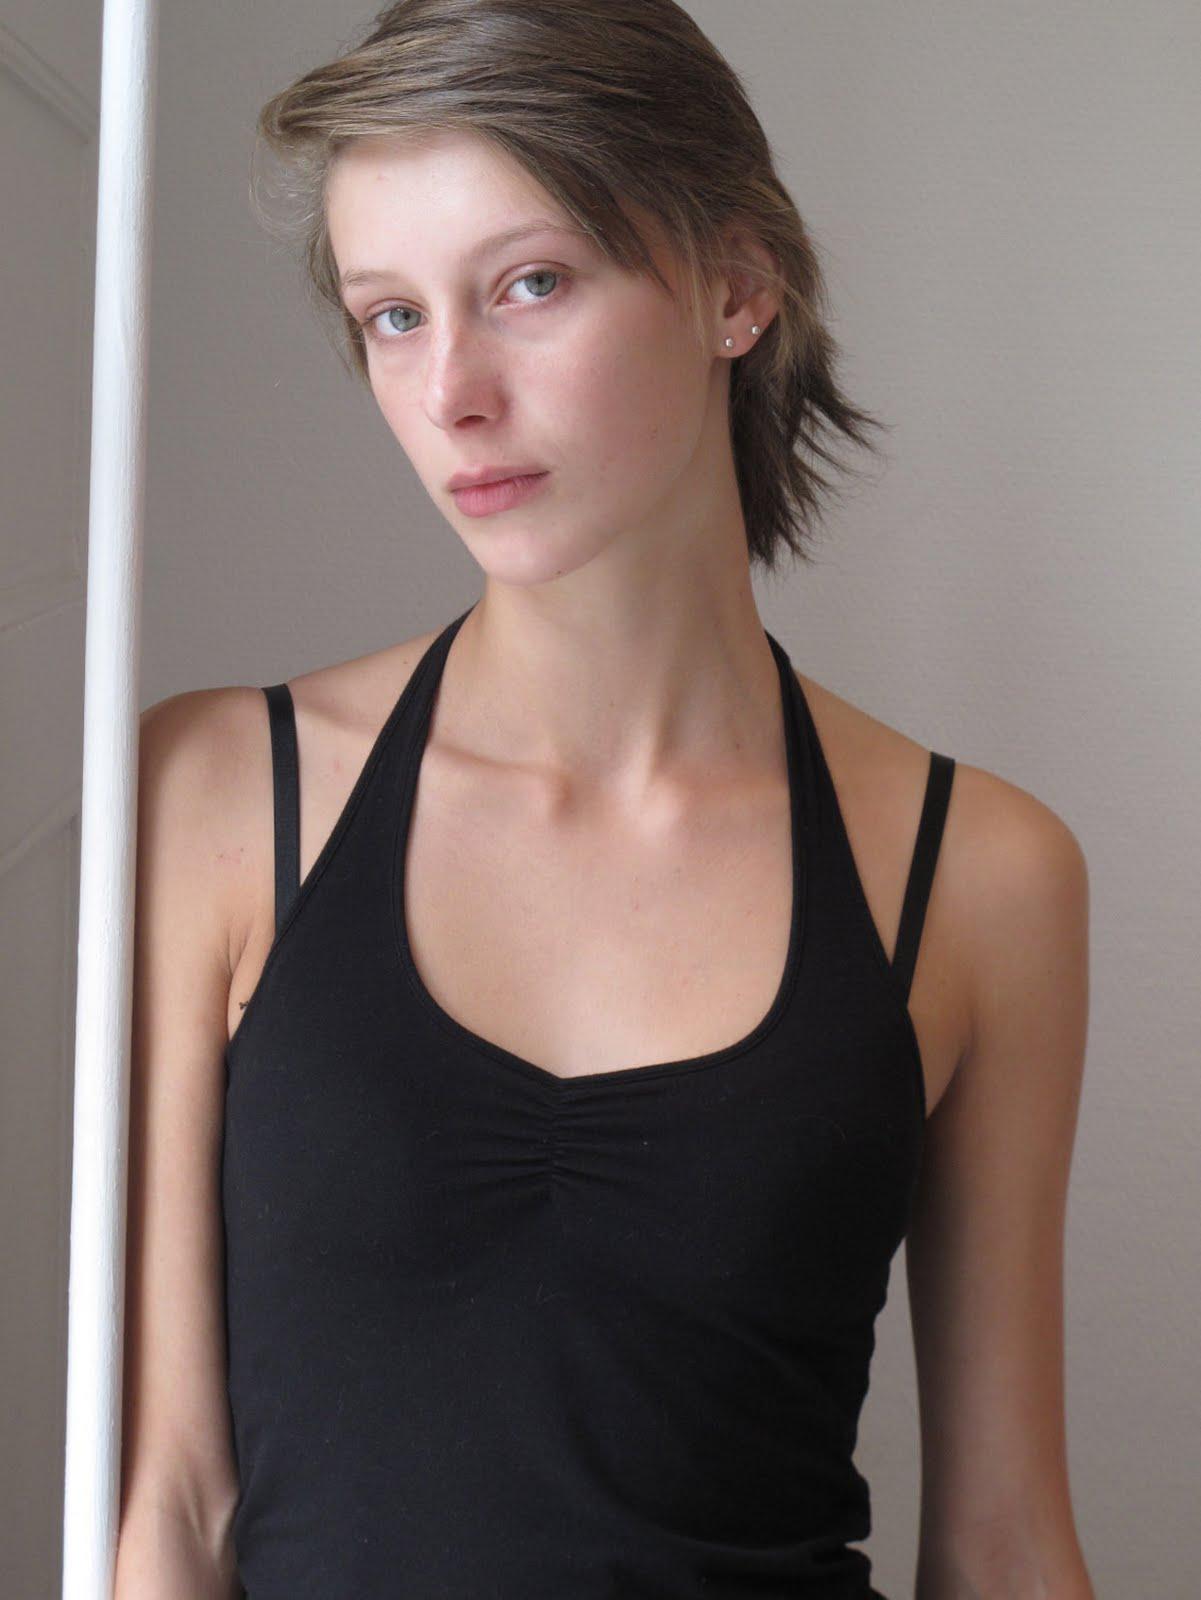 Paparazzi Yuliya Rossa naked (49 photos), Ass, Cleavage, Boobs, in bikini 2020